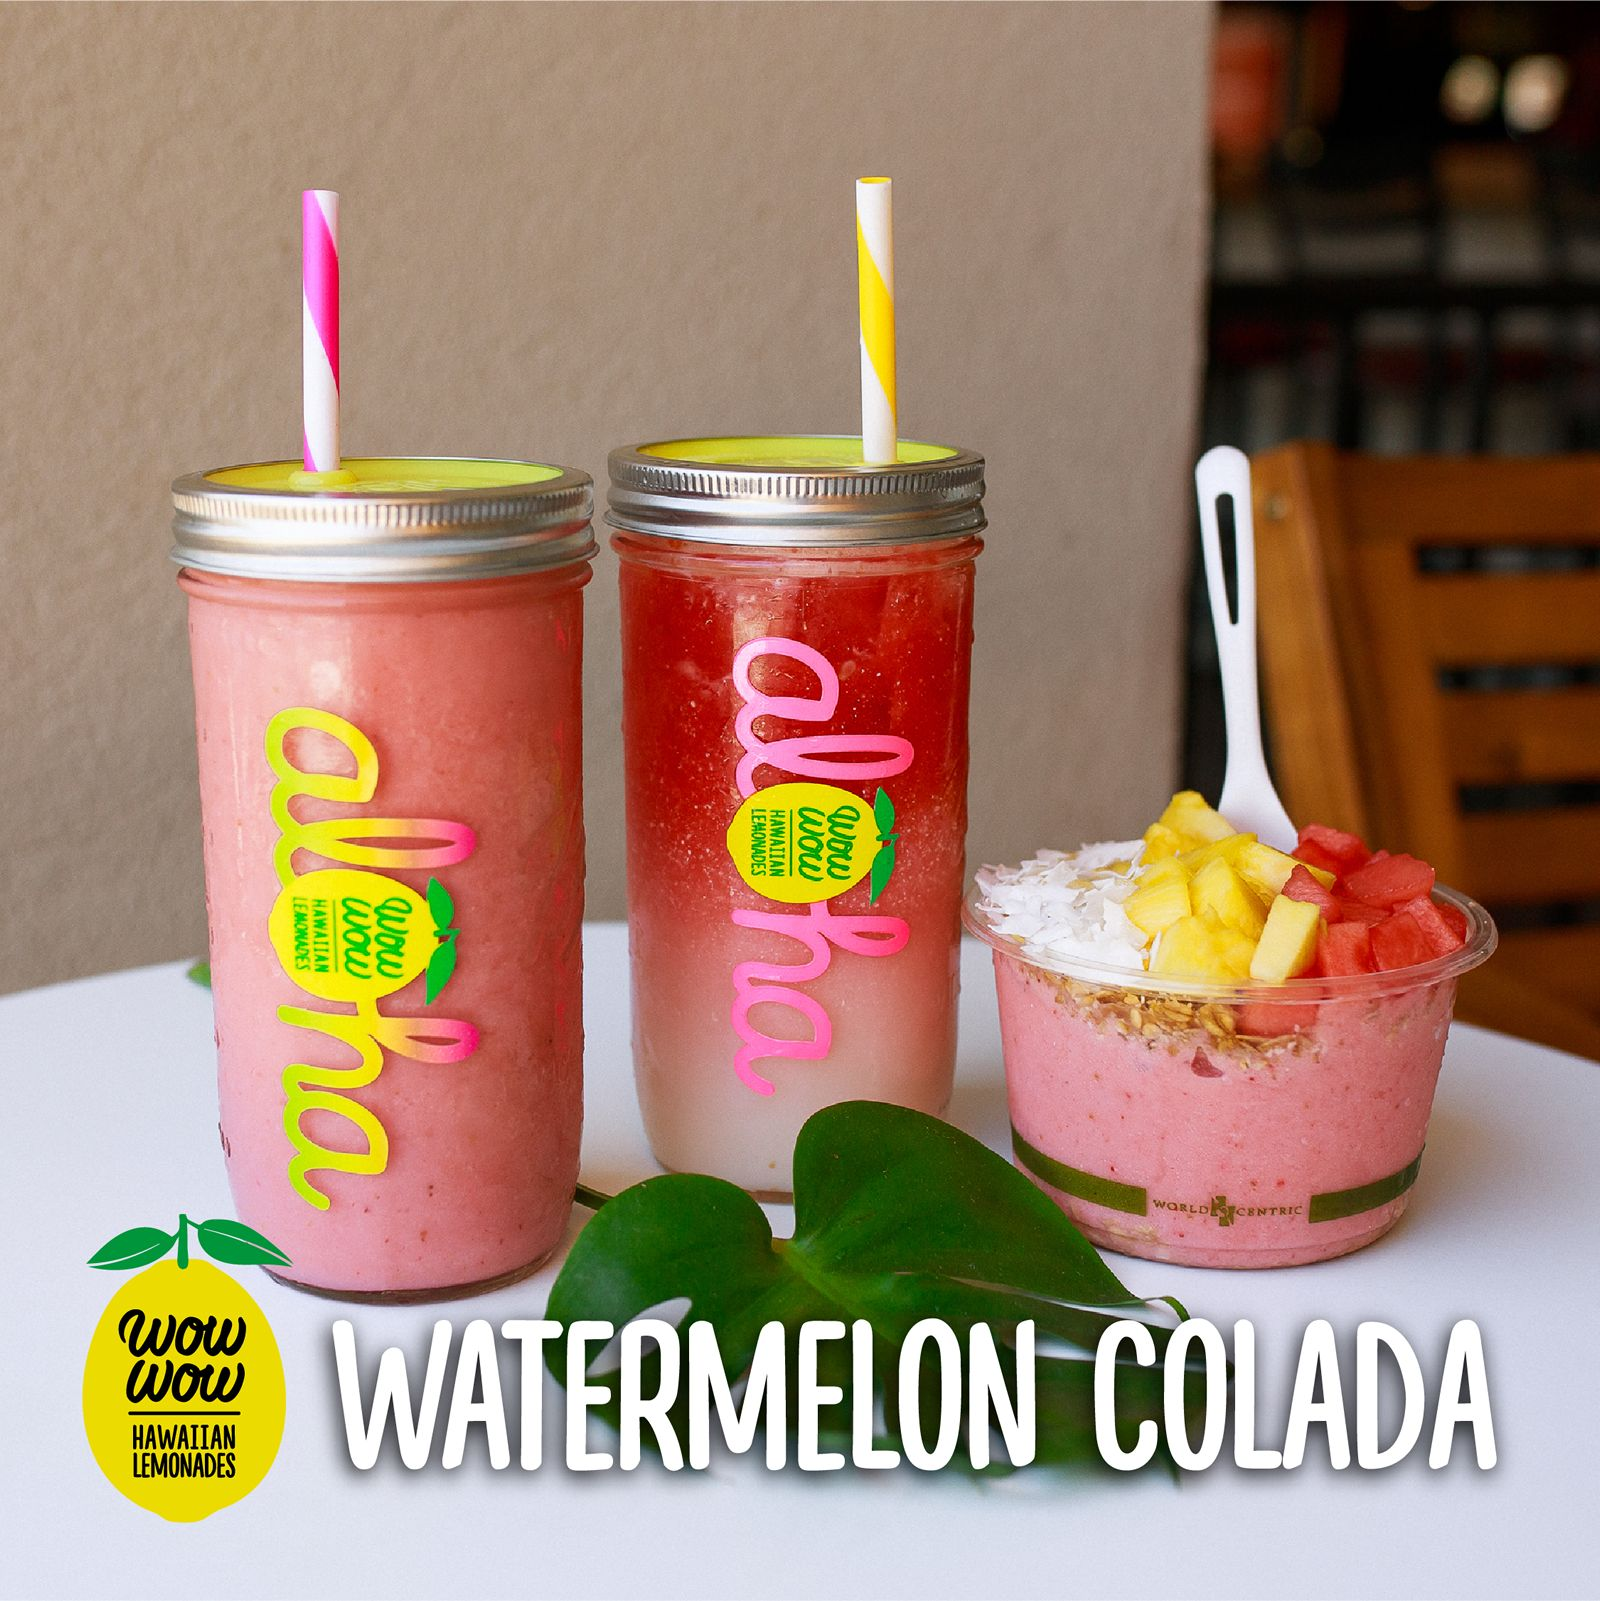 Wow Wow Hawaiian Lemonade Launches Summer Menu Featuring Watermelon Colada Smoothies, Bowls and Lemonades